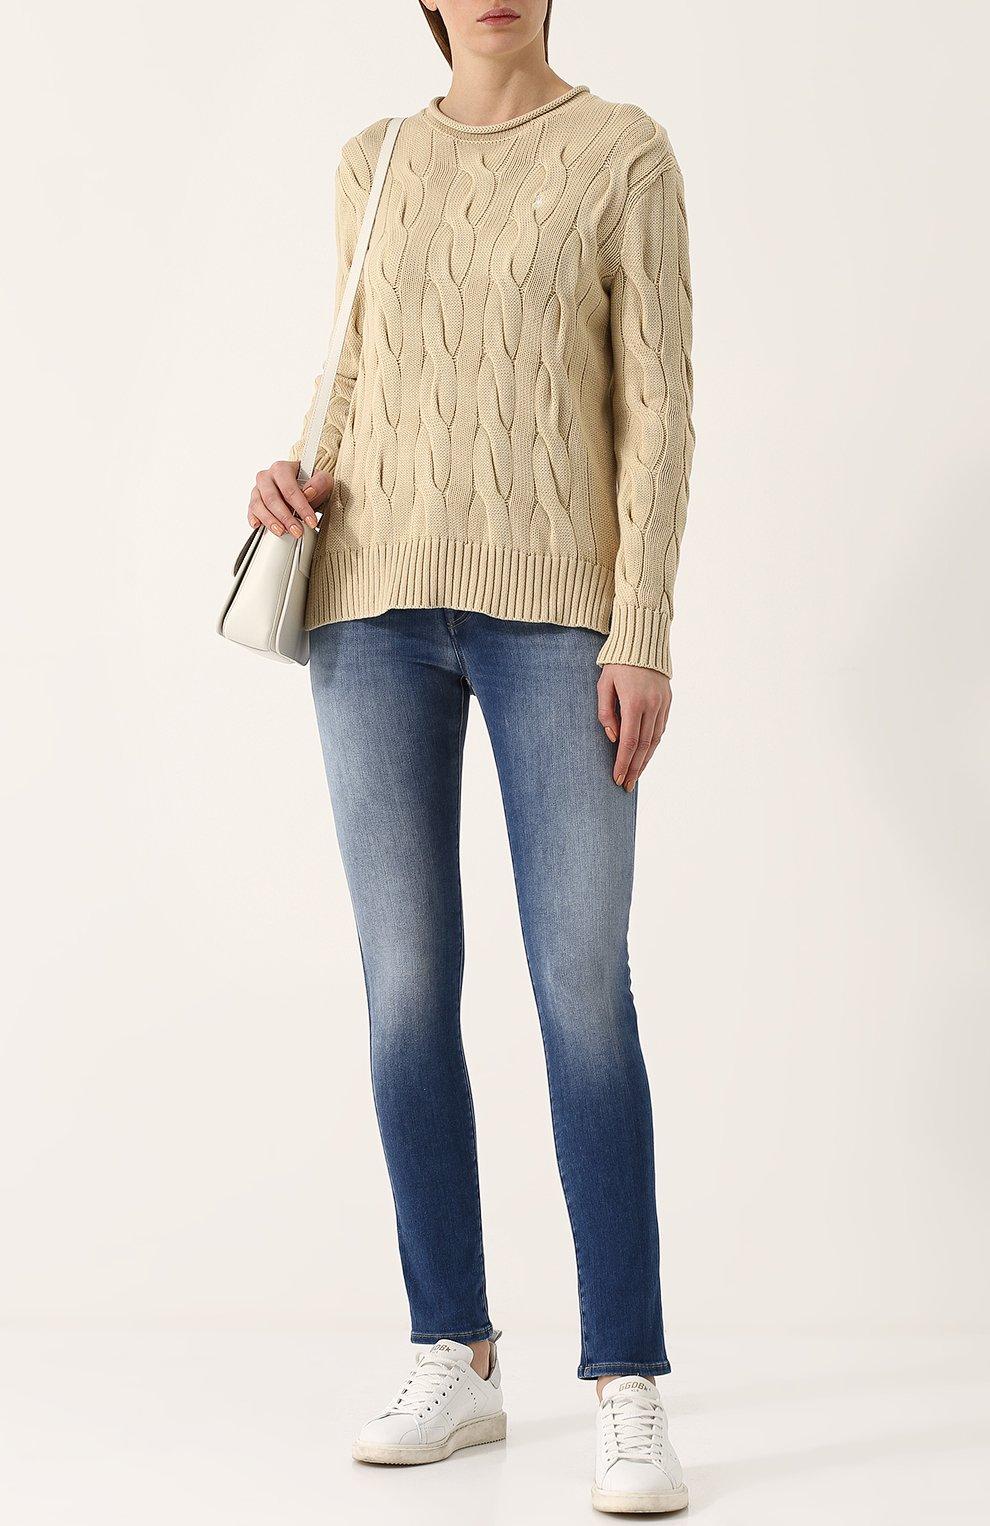 Пуловер фактурной вязки с логотипом бренда | Фото №2